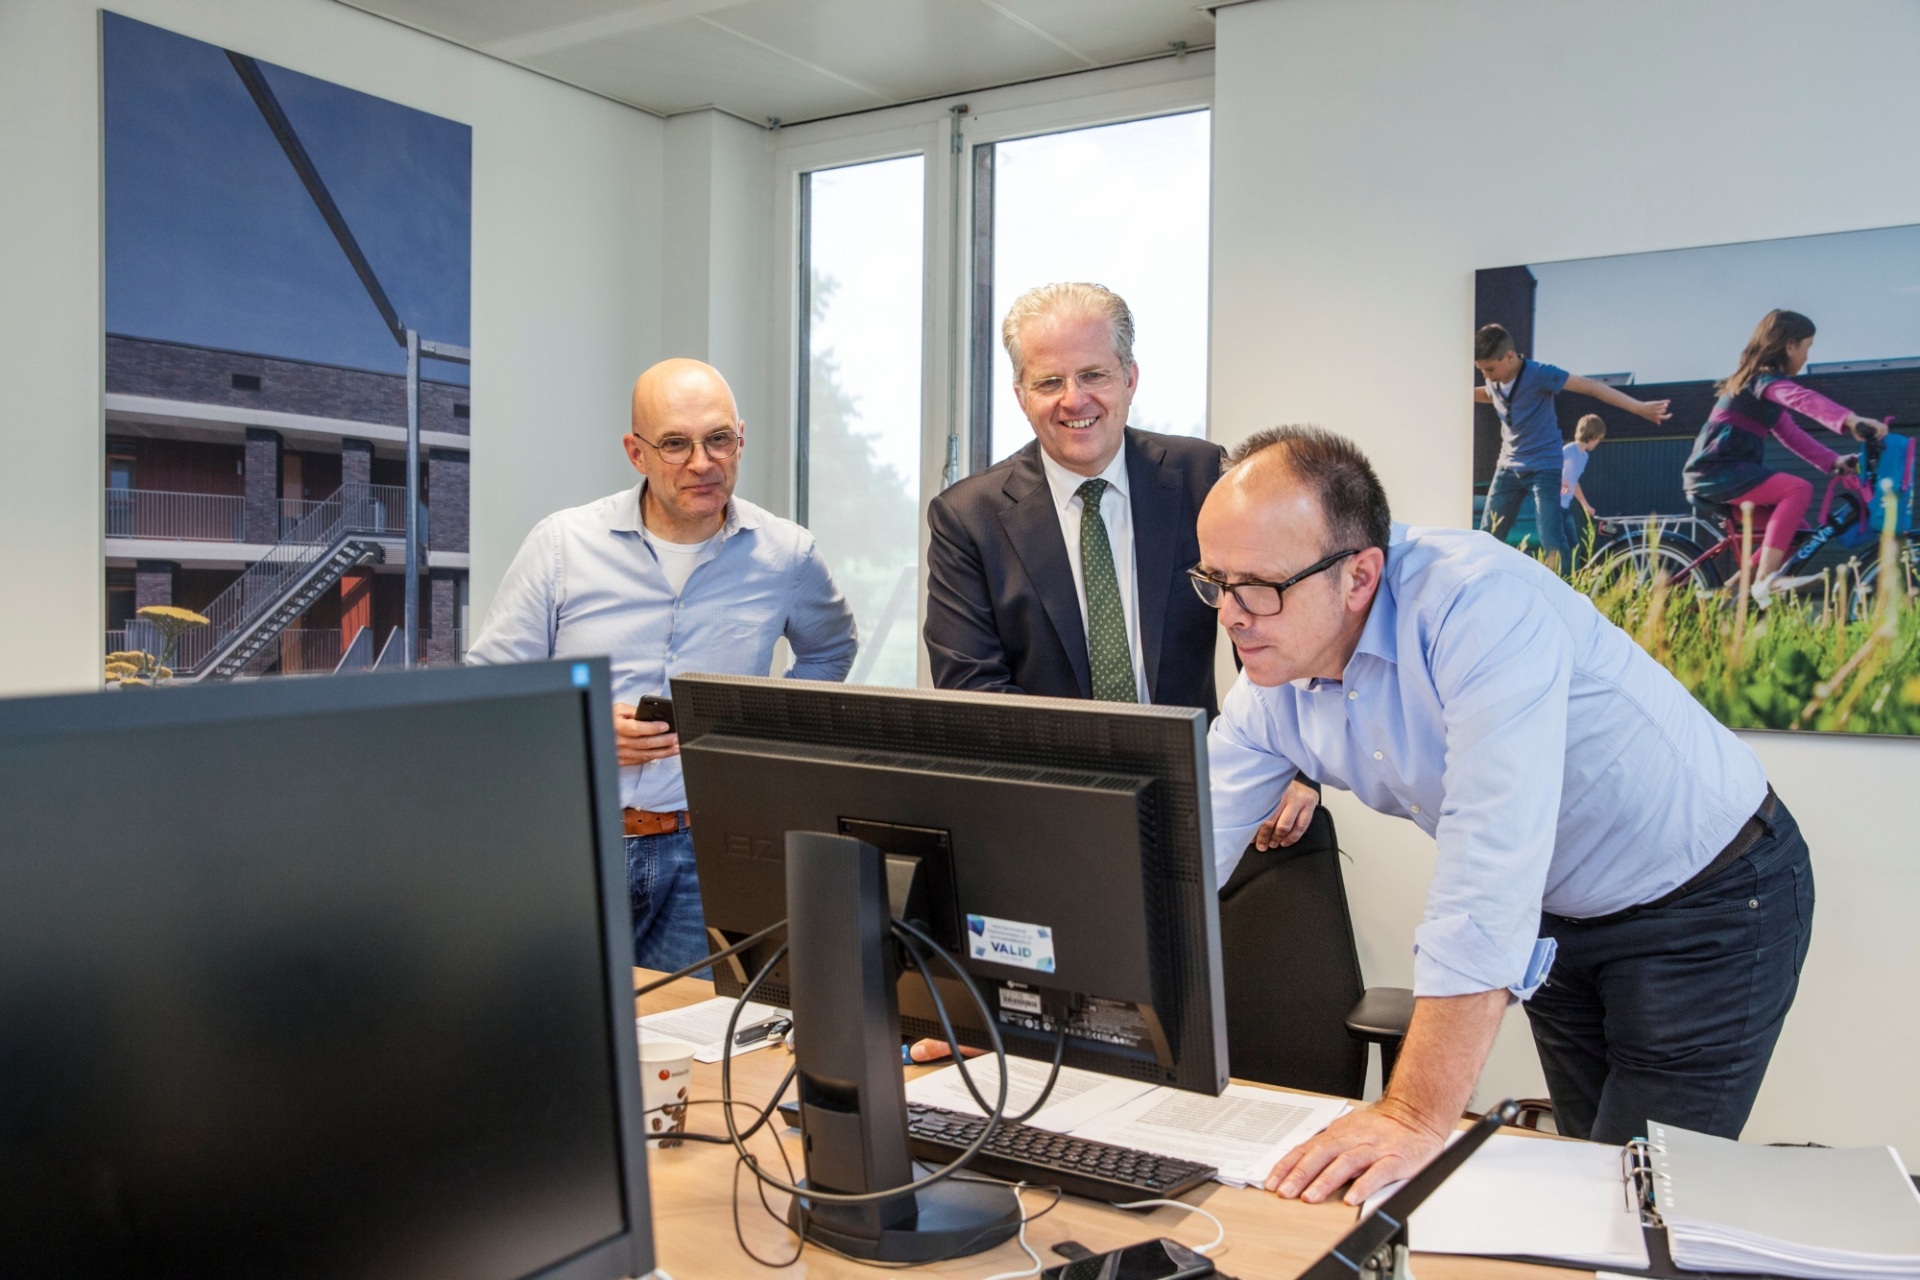 Guido Kerckhoffs, Hub Meulenberg en Marcel Salobir 2.jpg